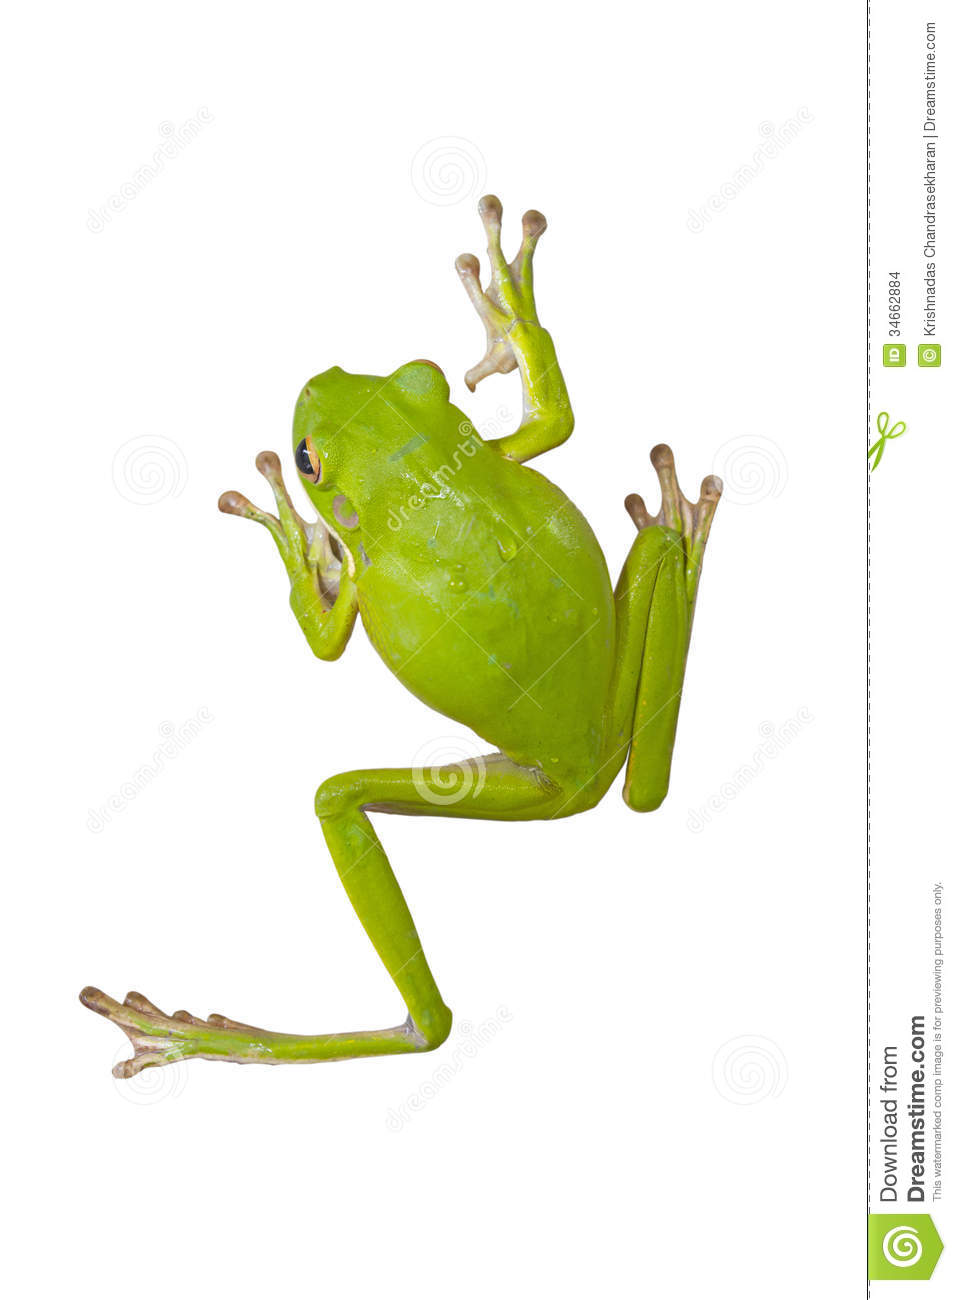 tree frog climbing tree clipart - Clipground